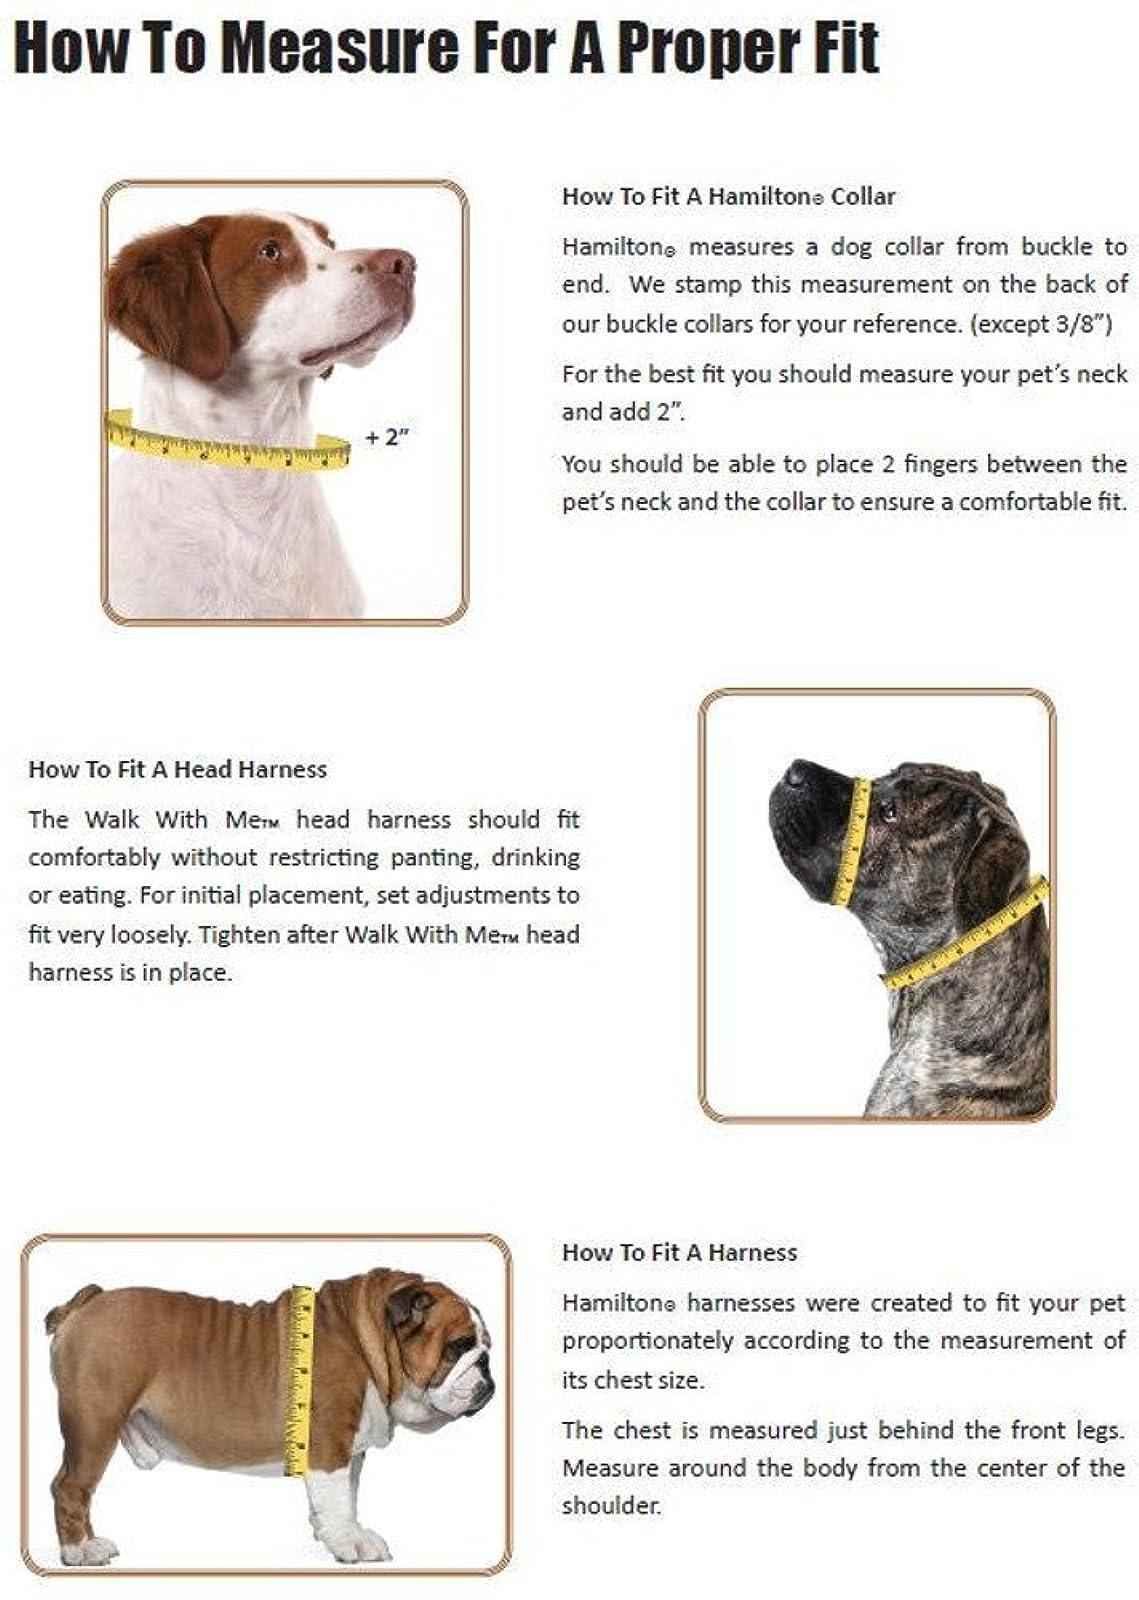 Hamilton Adjustable Dog Collar with Brushed Hardware B FAL 18/26 RS - 1